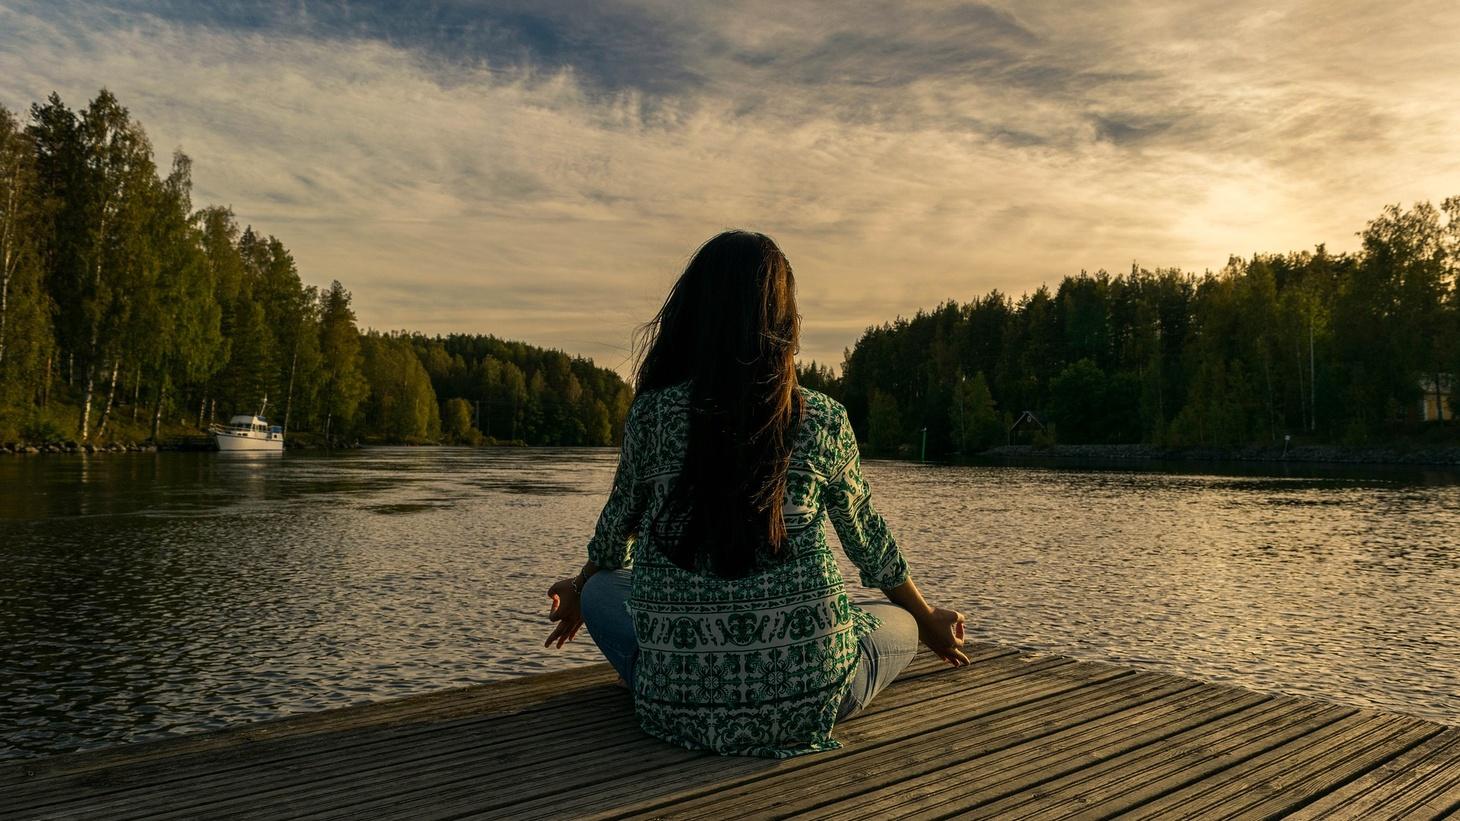 A woman meditating outdoors.